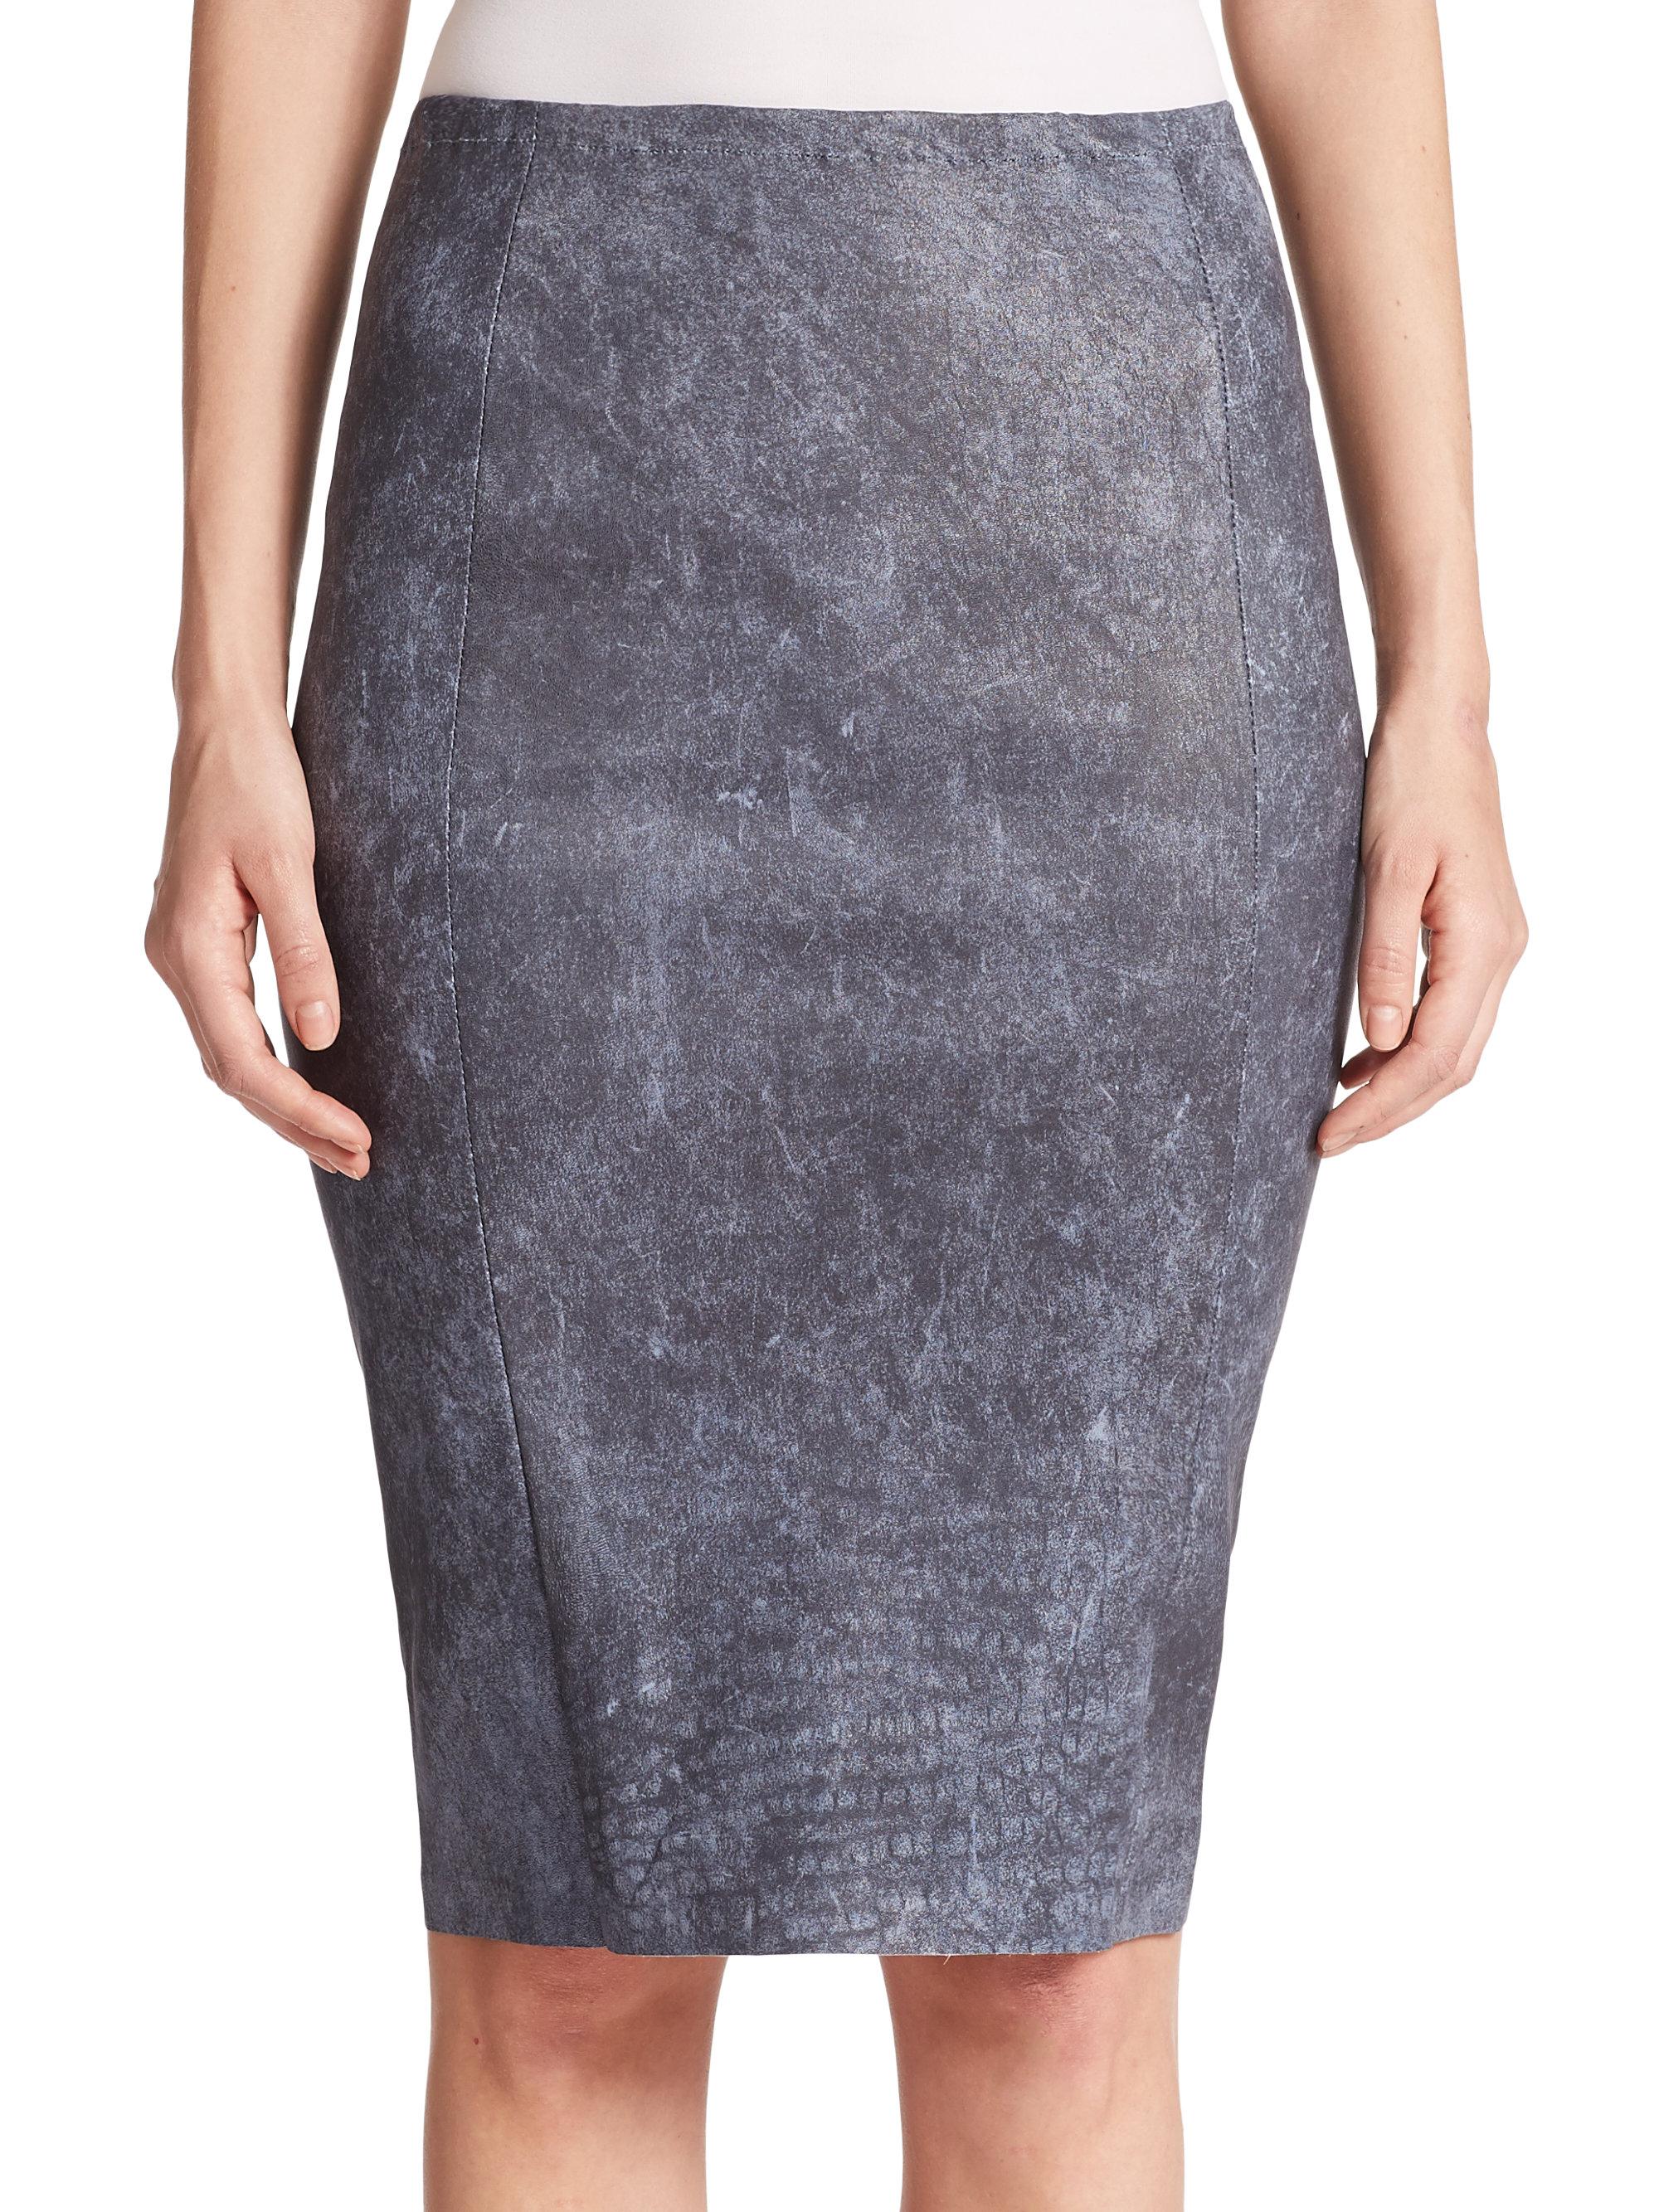 Elie tahari Pamela Leather Pencil Skirt in Blue | Lyst